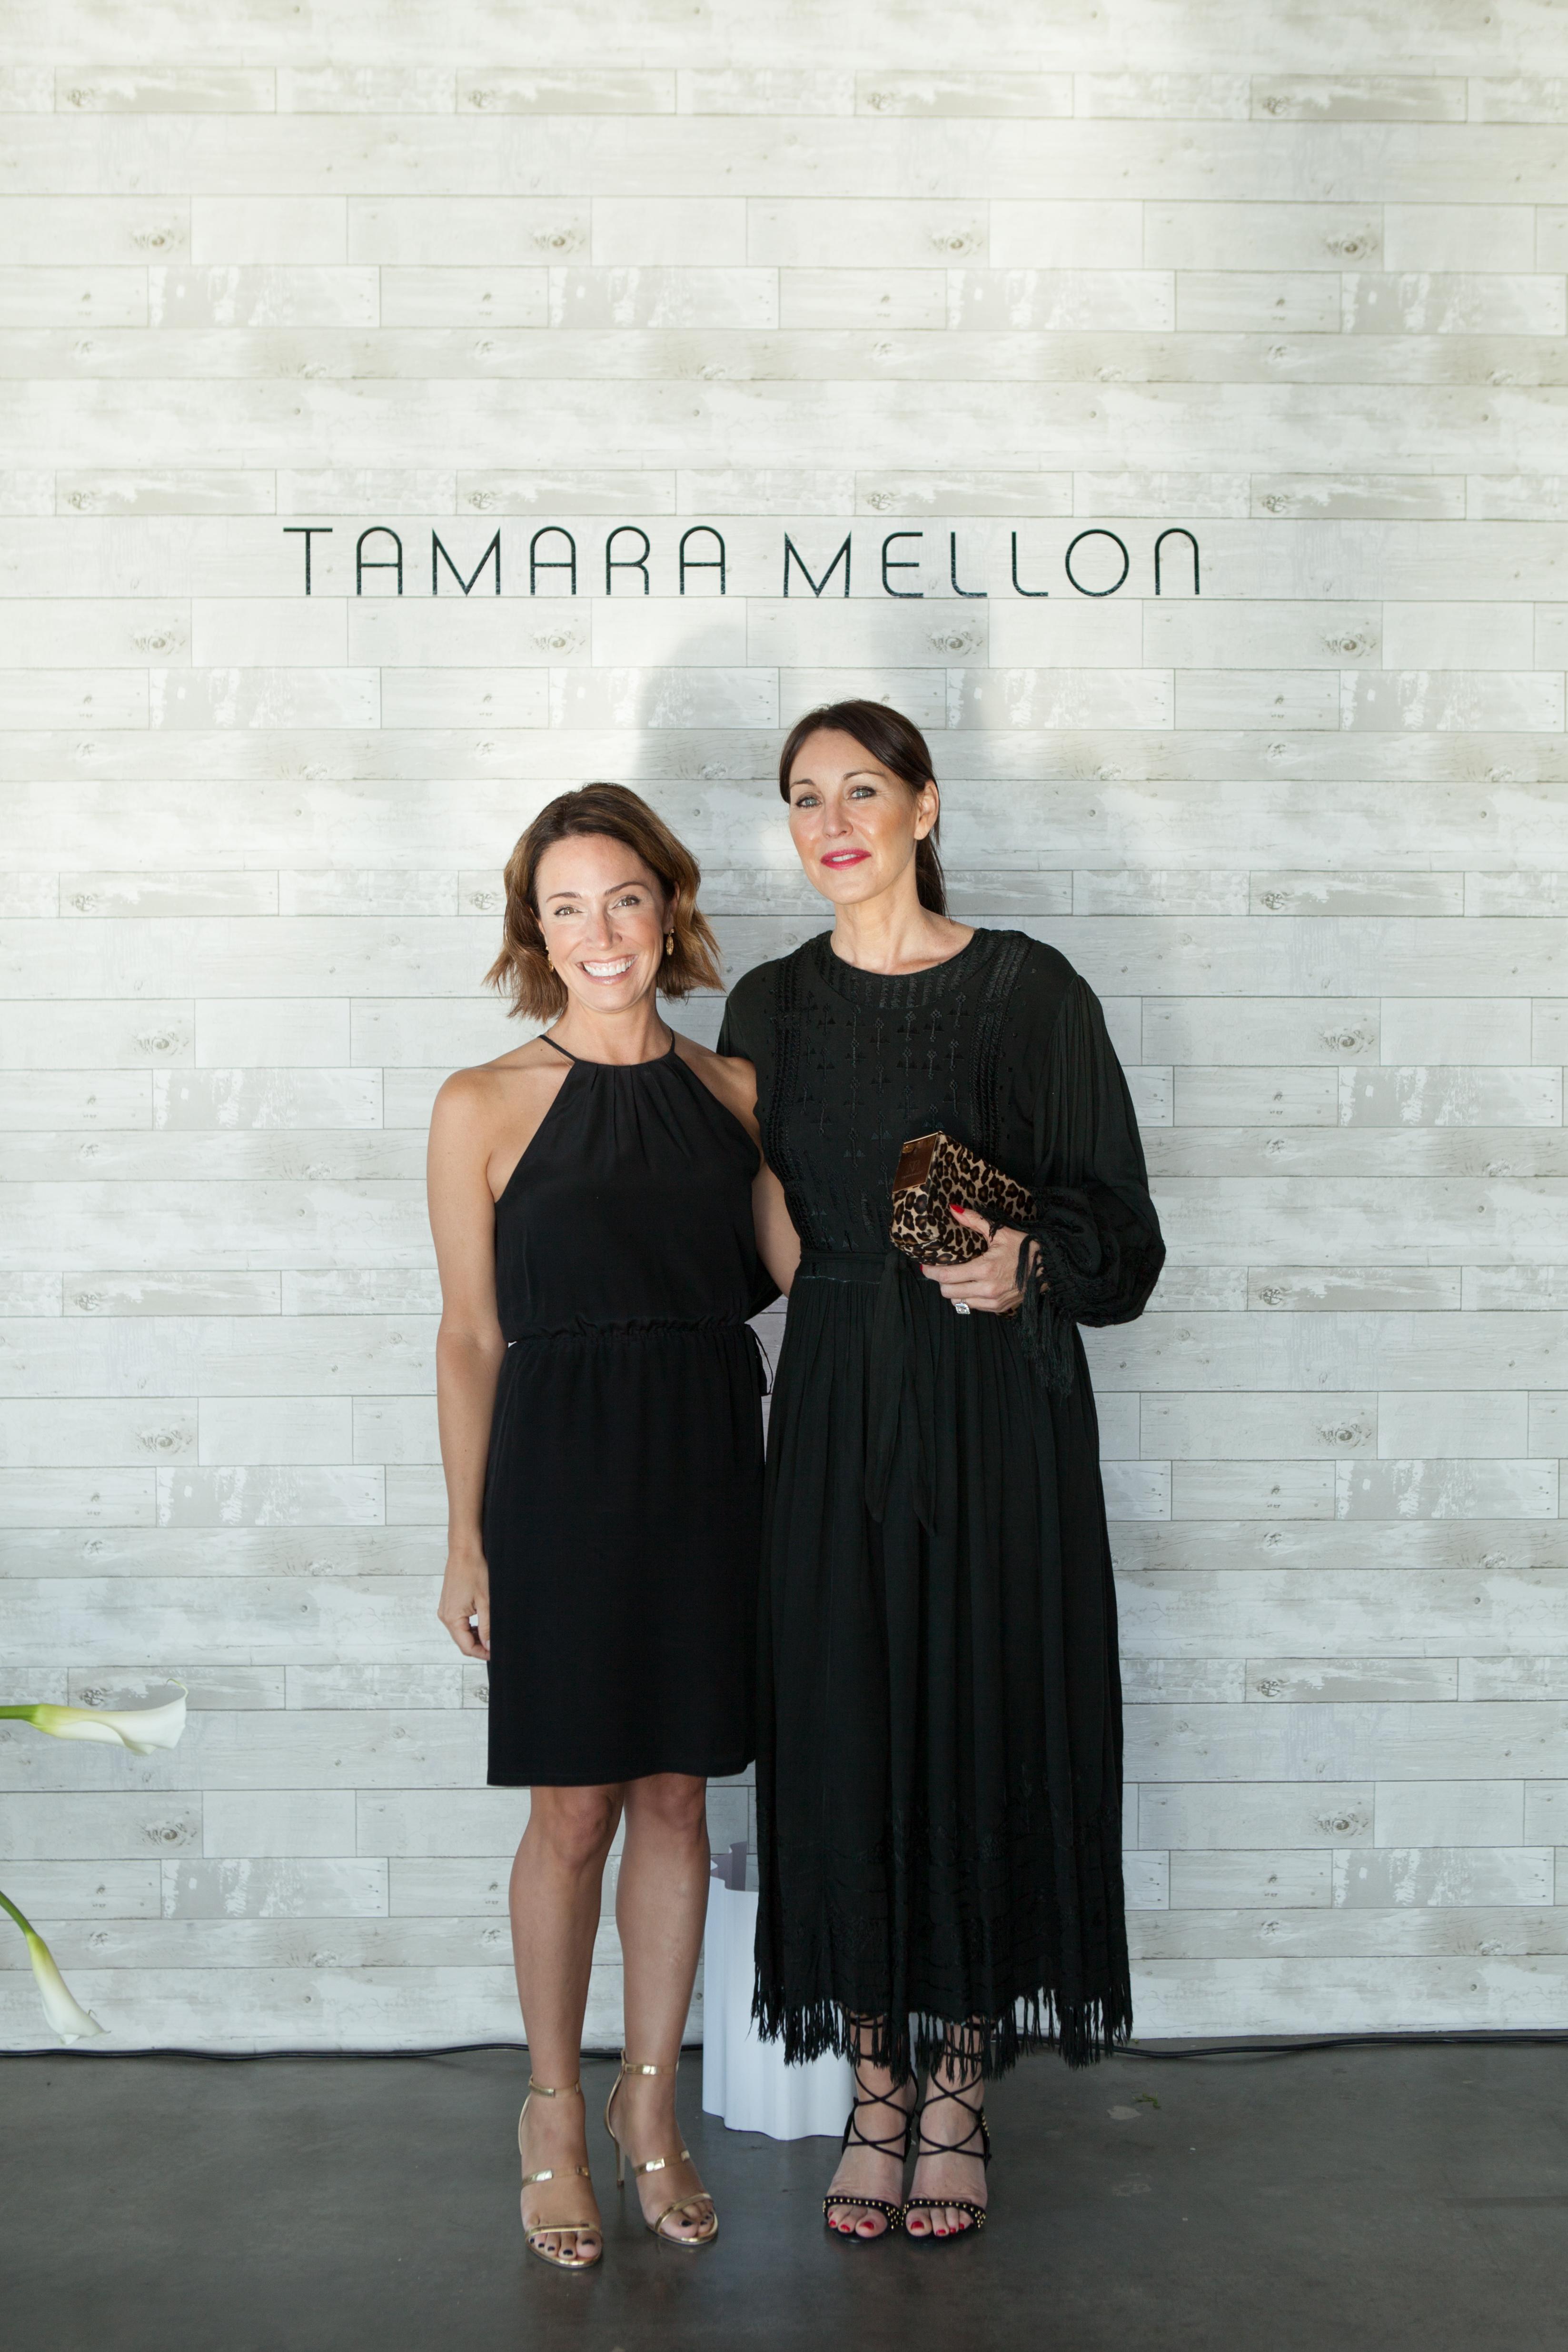 Jill Layfield and Tamara Mellon